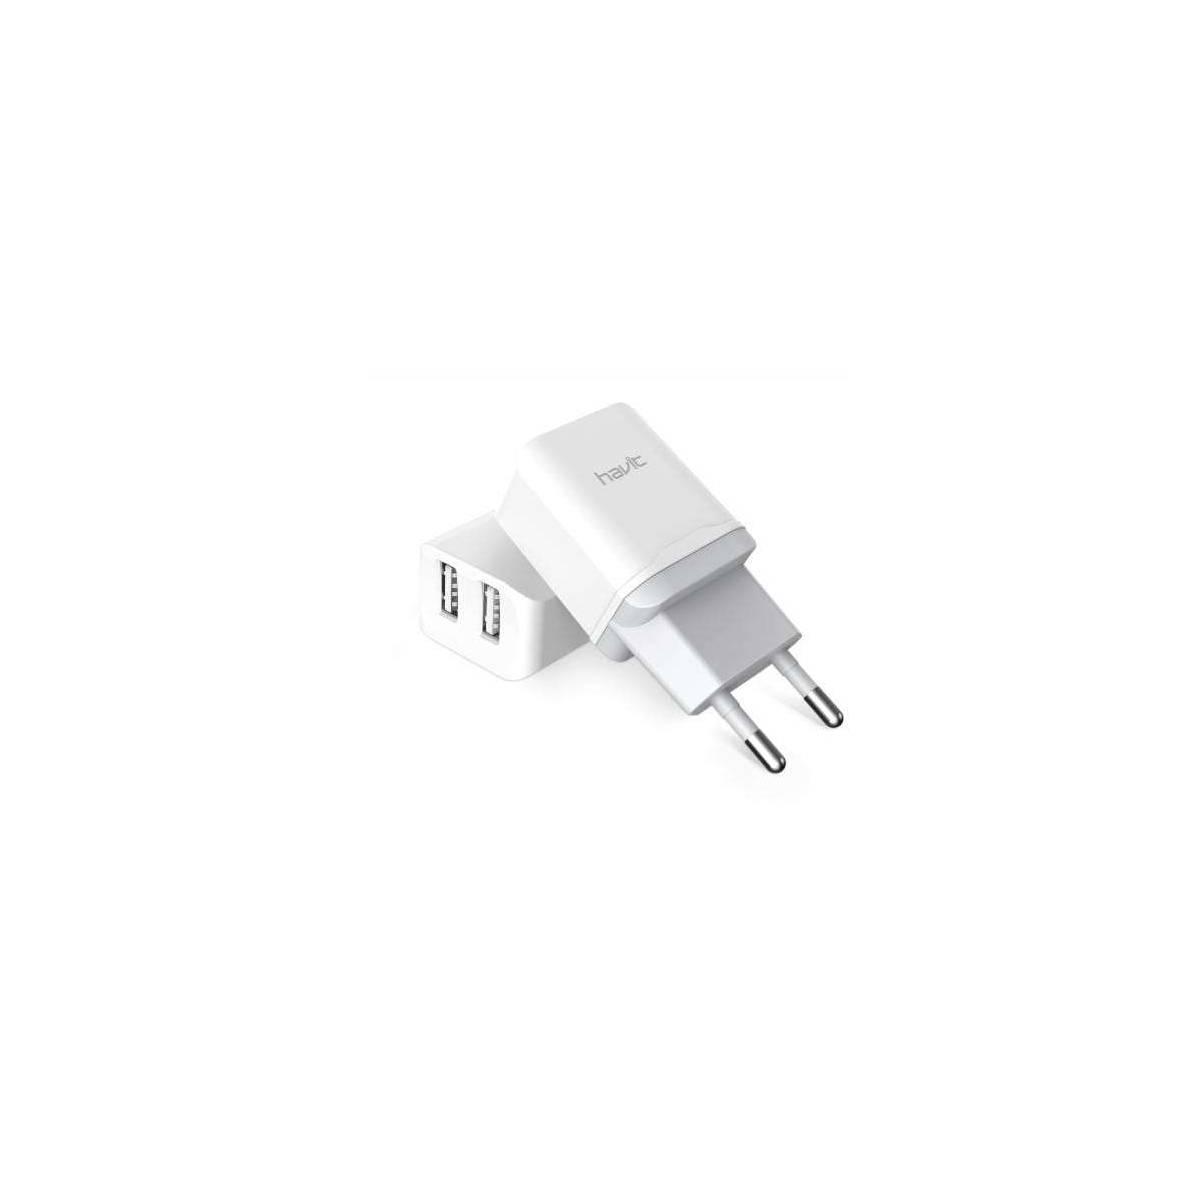 Baseus iPhoneiPad USB lader Mackabler.no fra Baseus